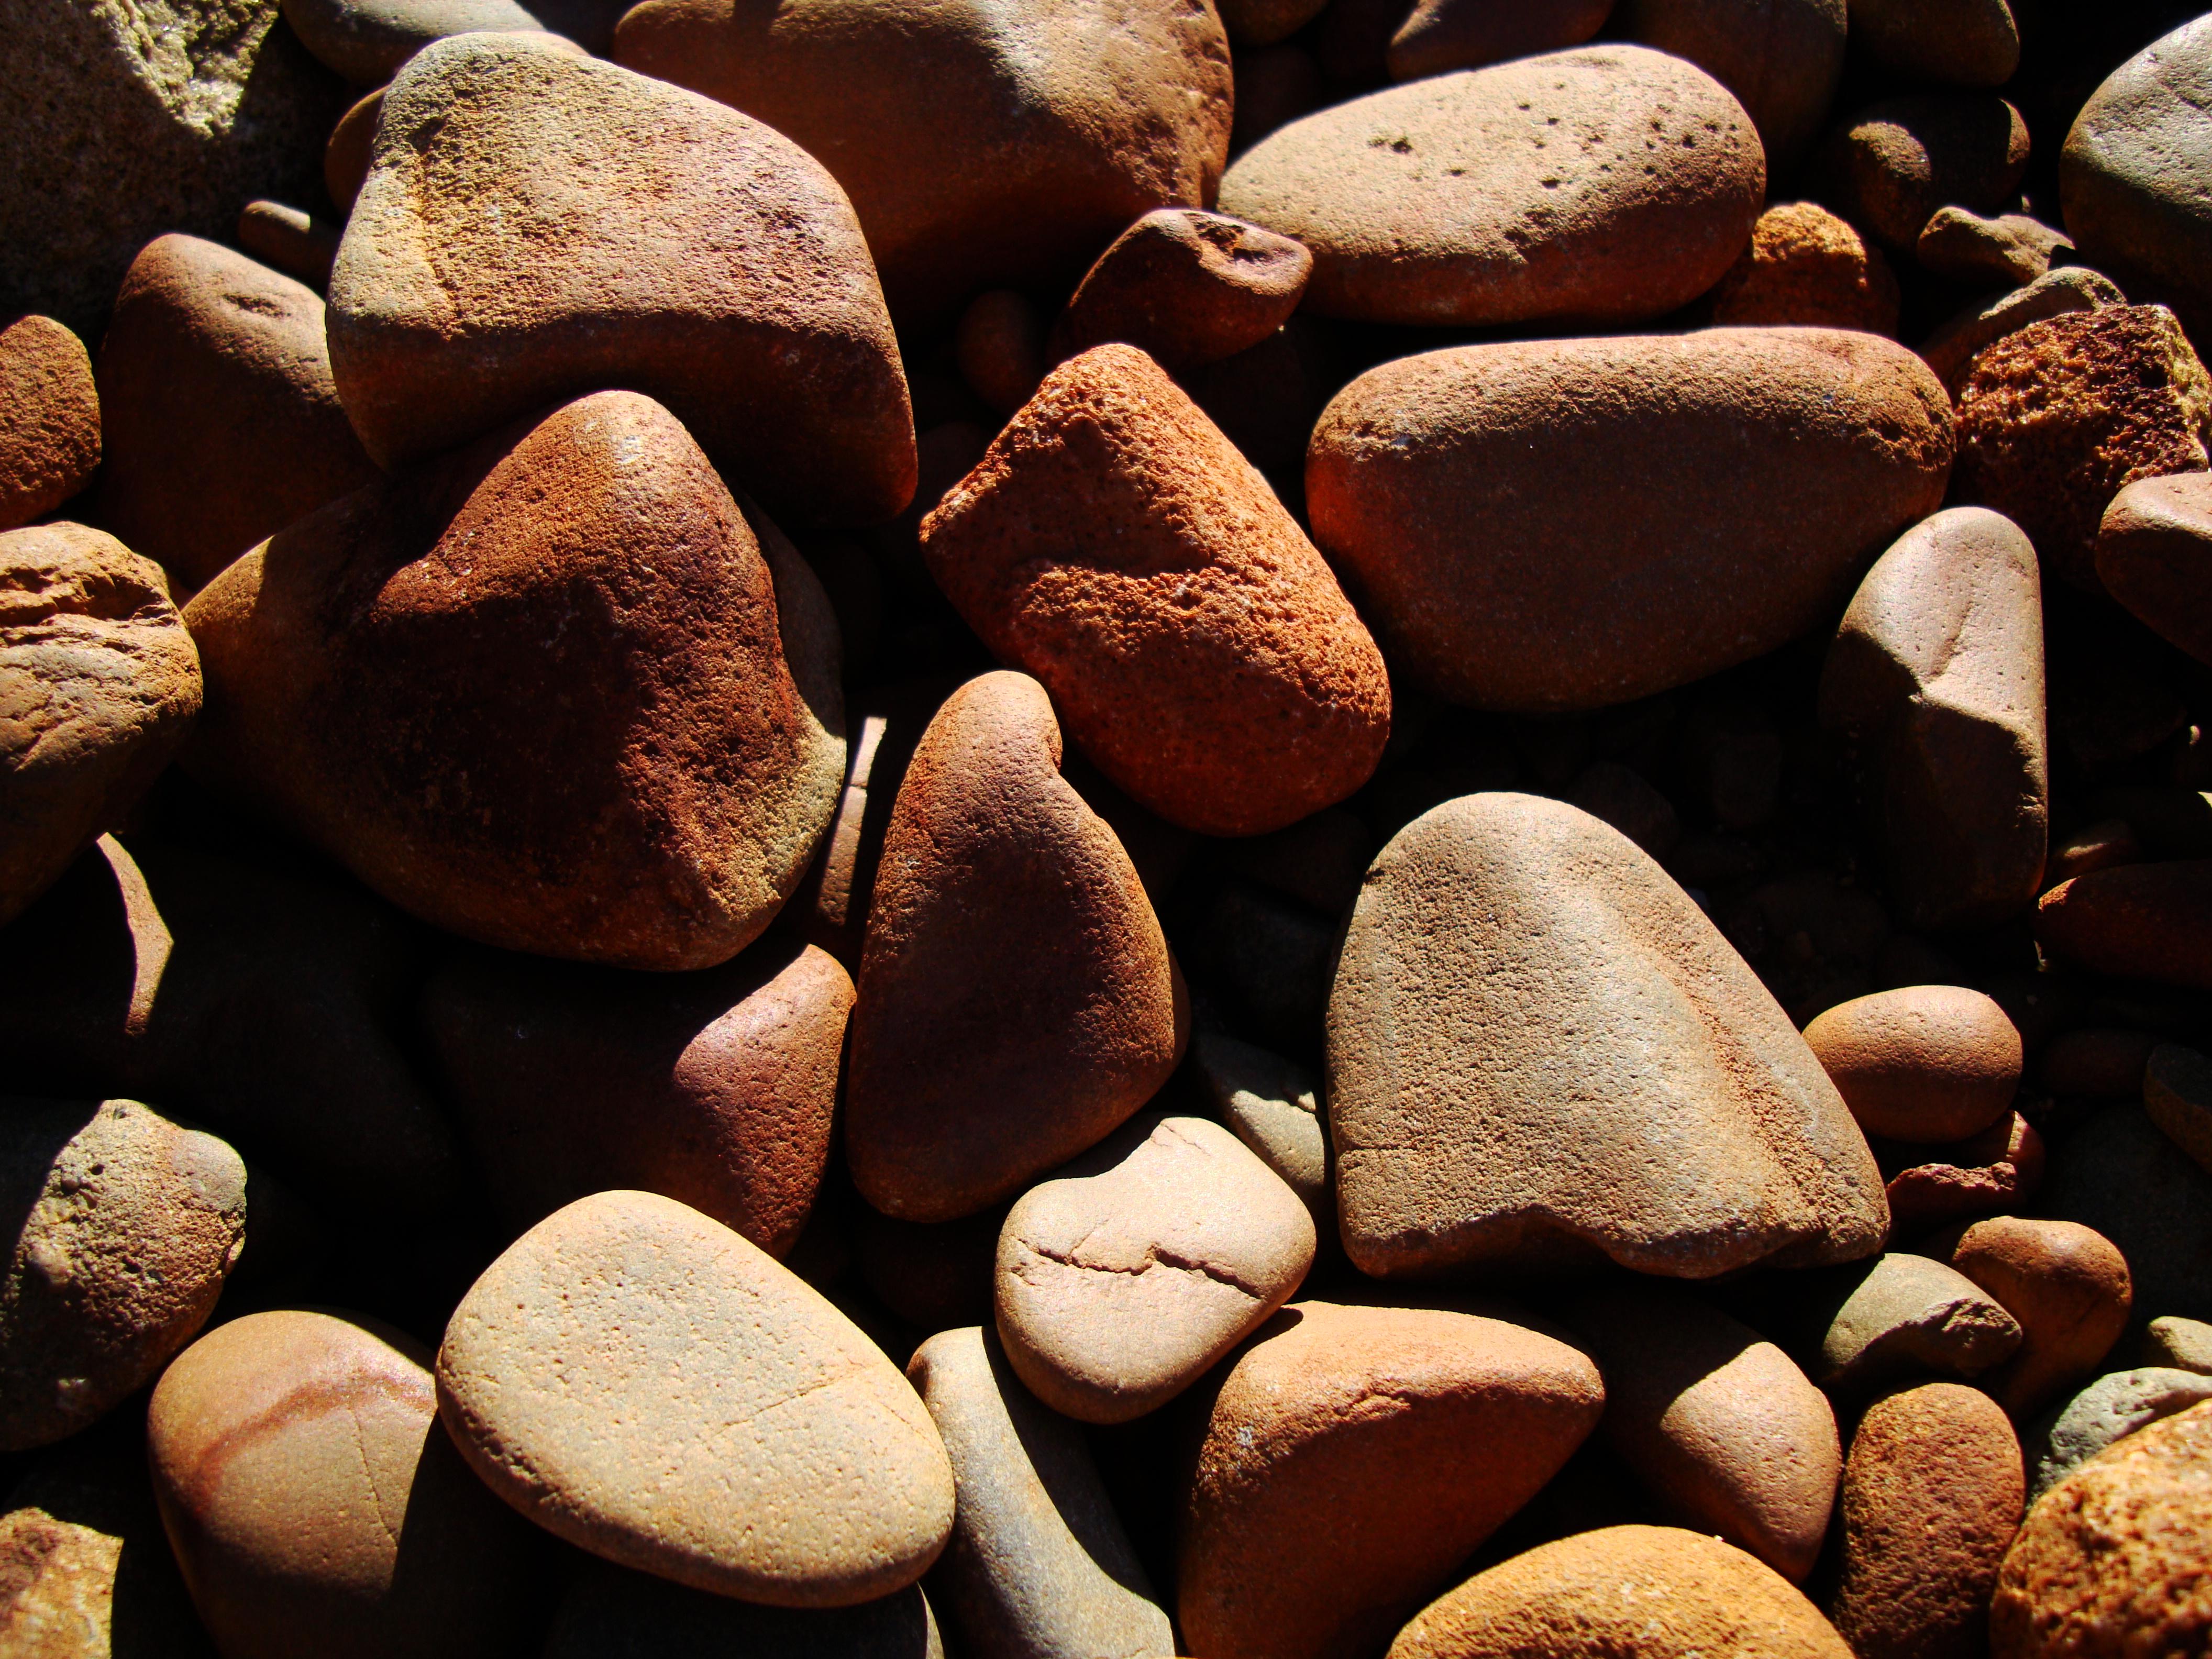 Textures Stones Pebbles Noosa National Park 19